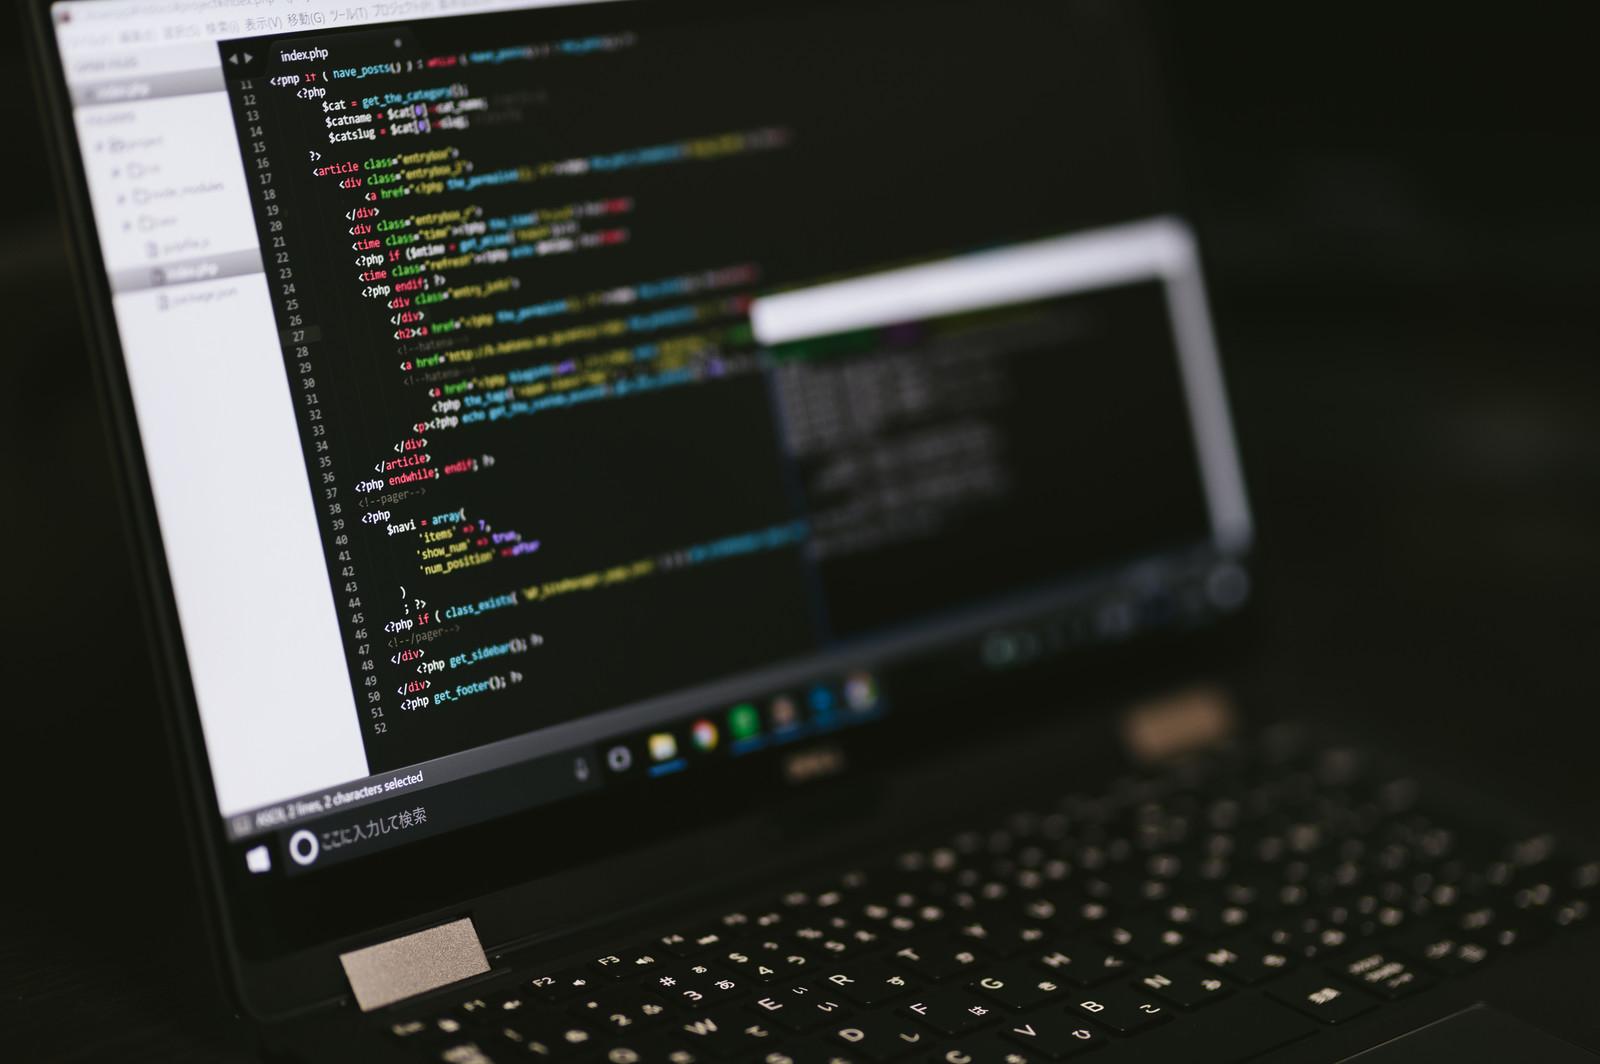 【Python環境構築】環境変数について解説!